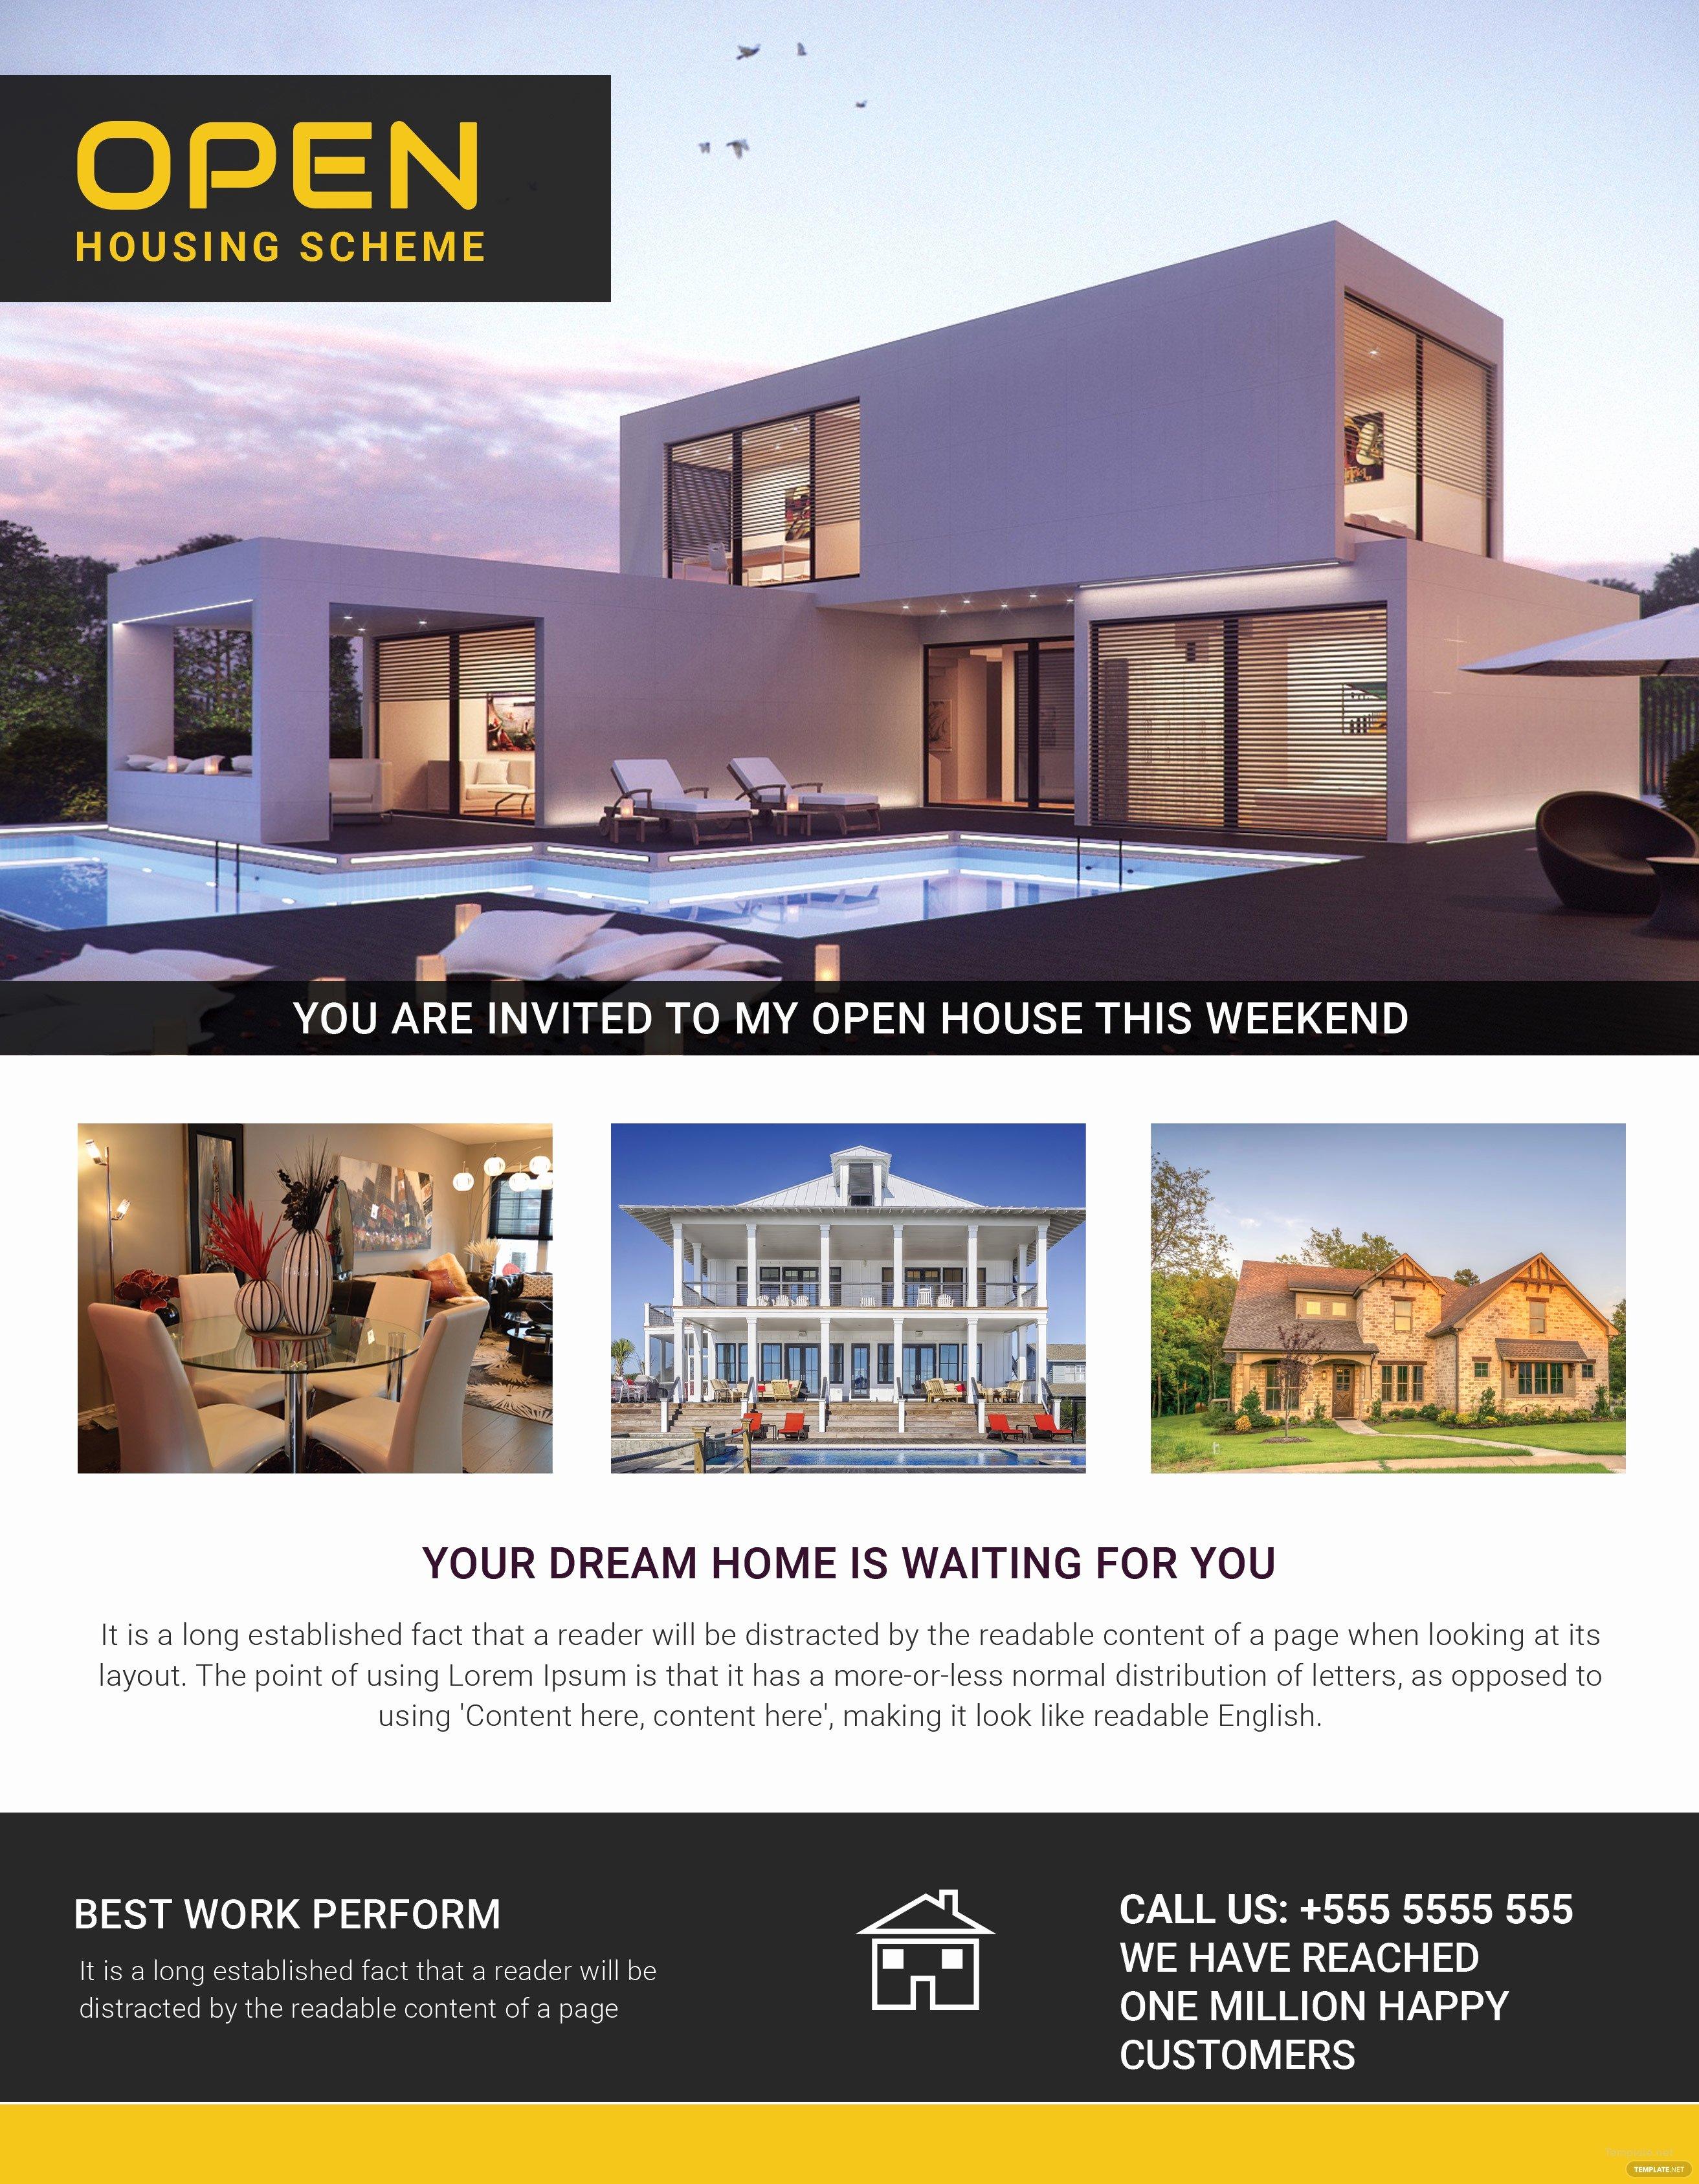 Broker Open House Flyer Best Of Open Housing Scheme Flyer Template In Adobe Shop